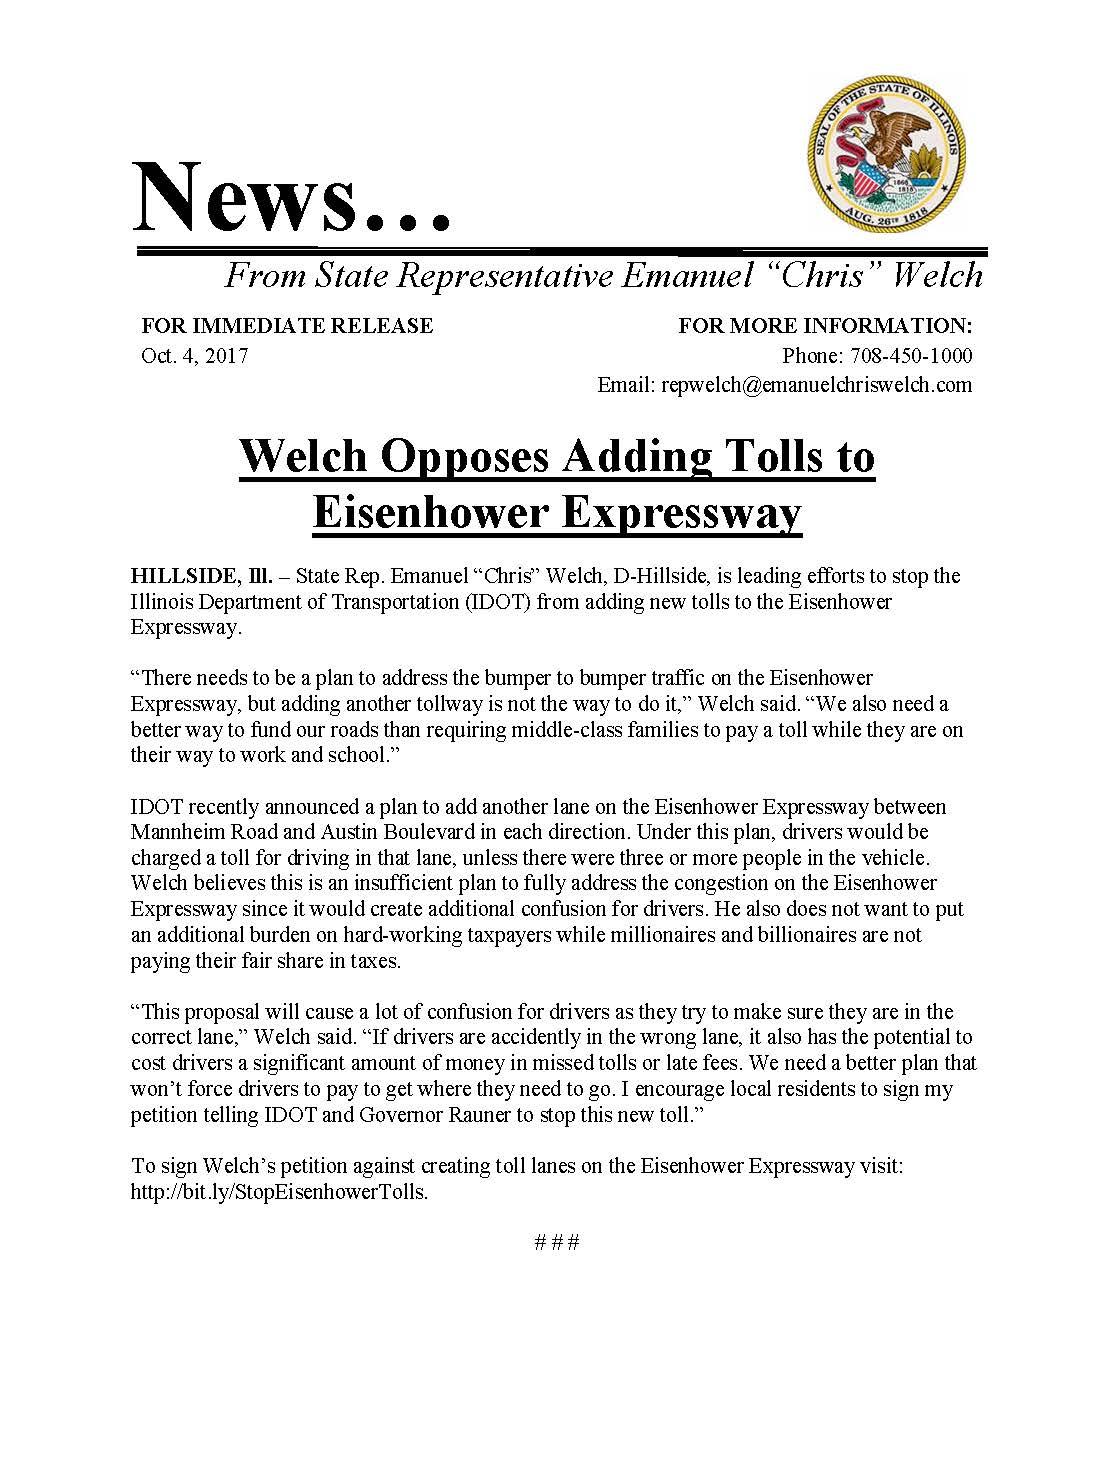 Welch Opposes Adding Tolls to Eisenhower Expressway  (October 4, 2017)